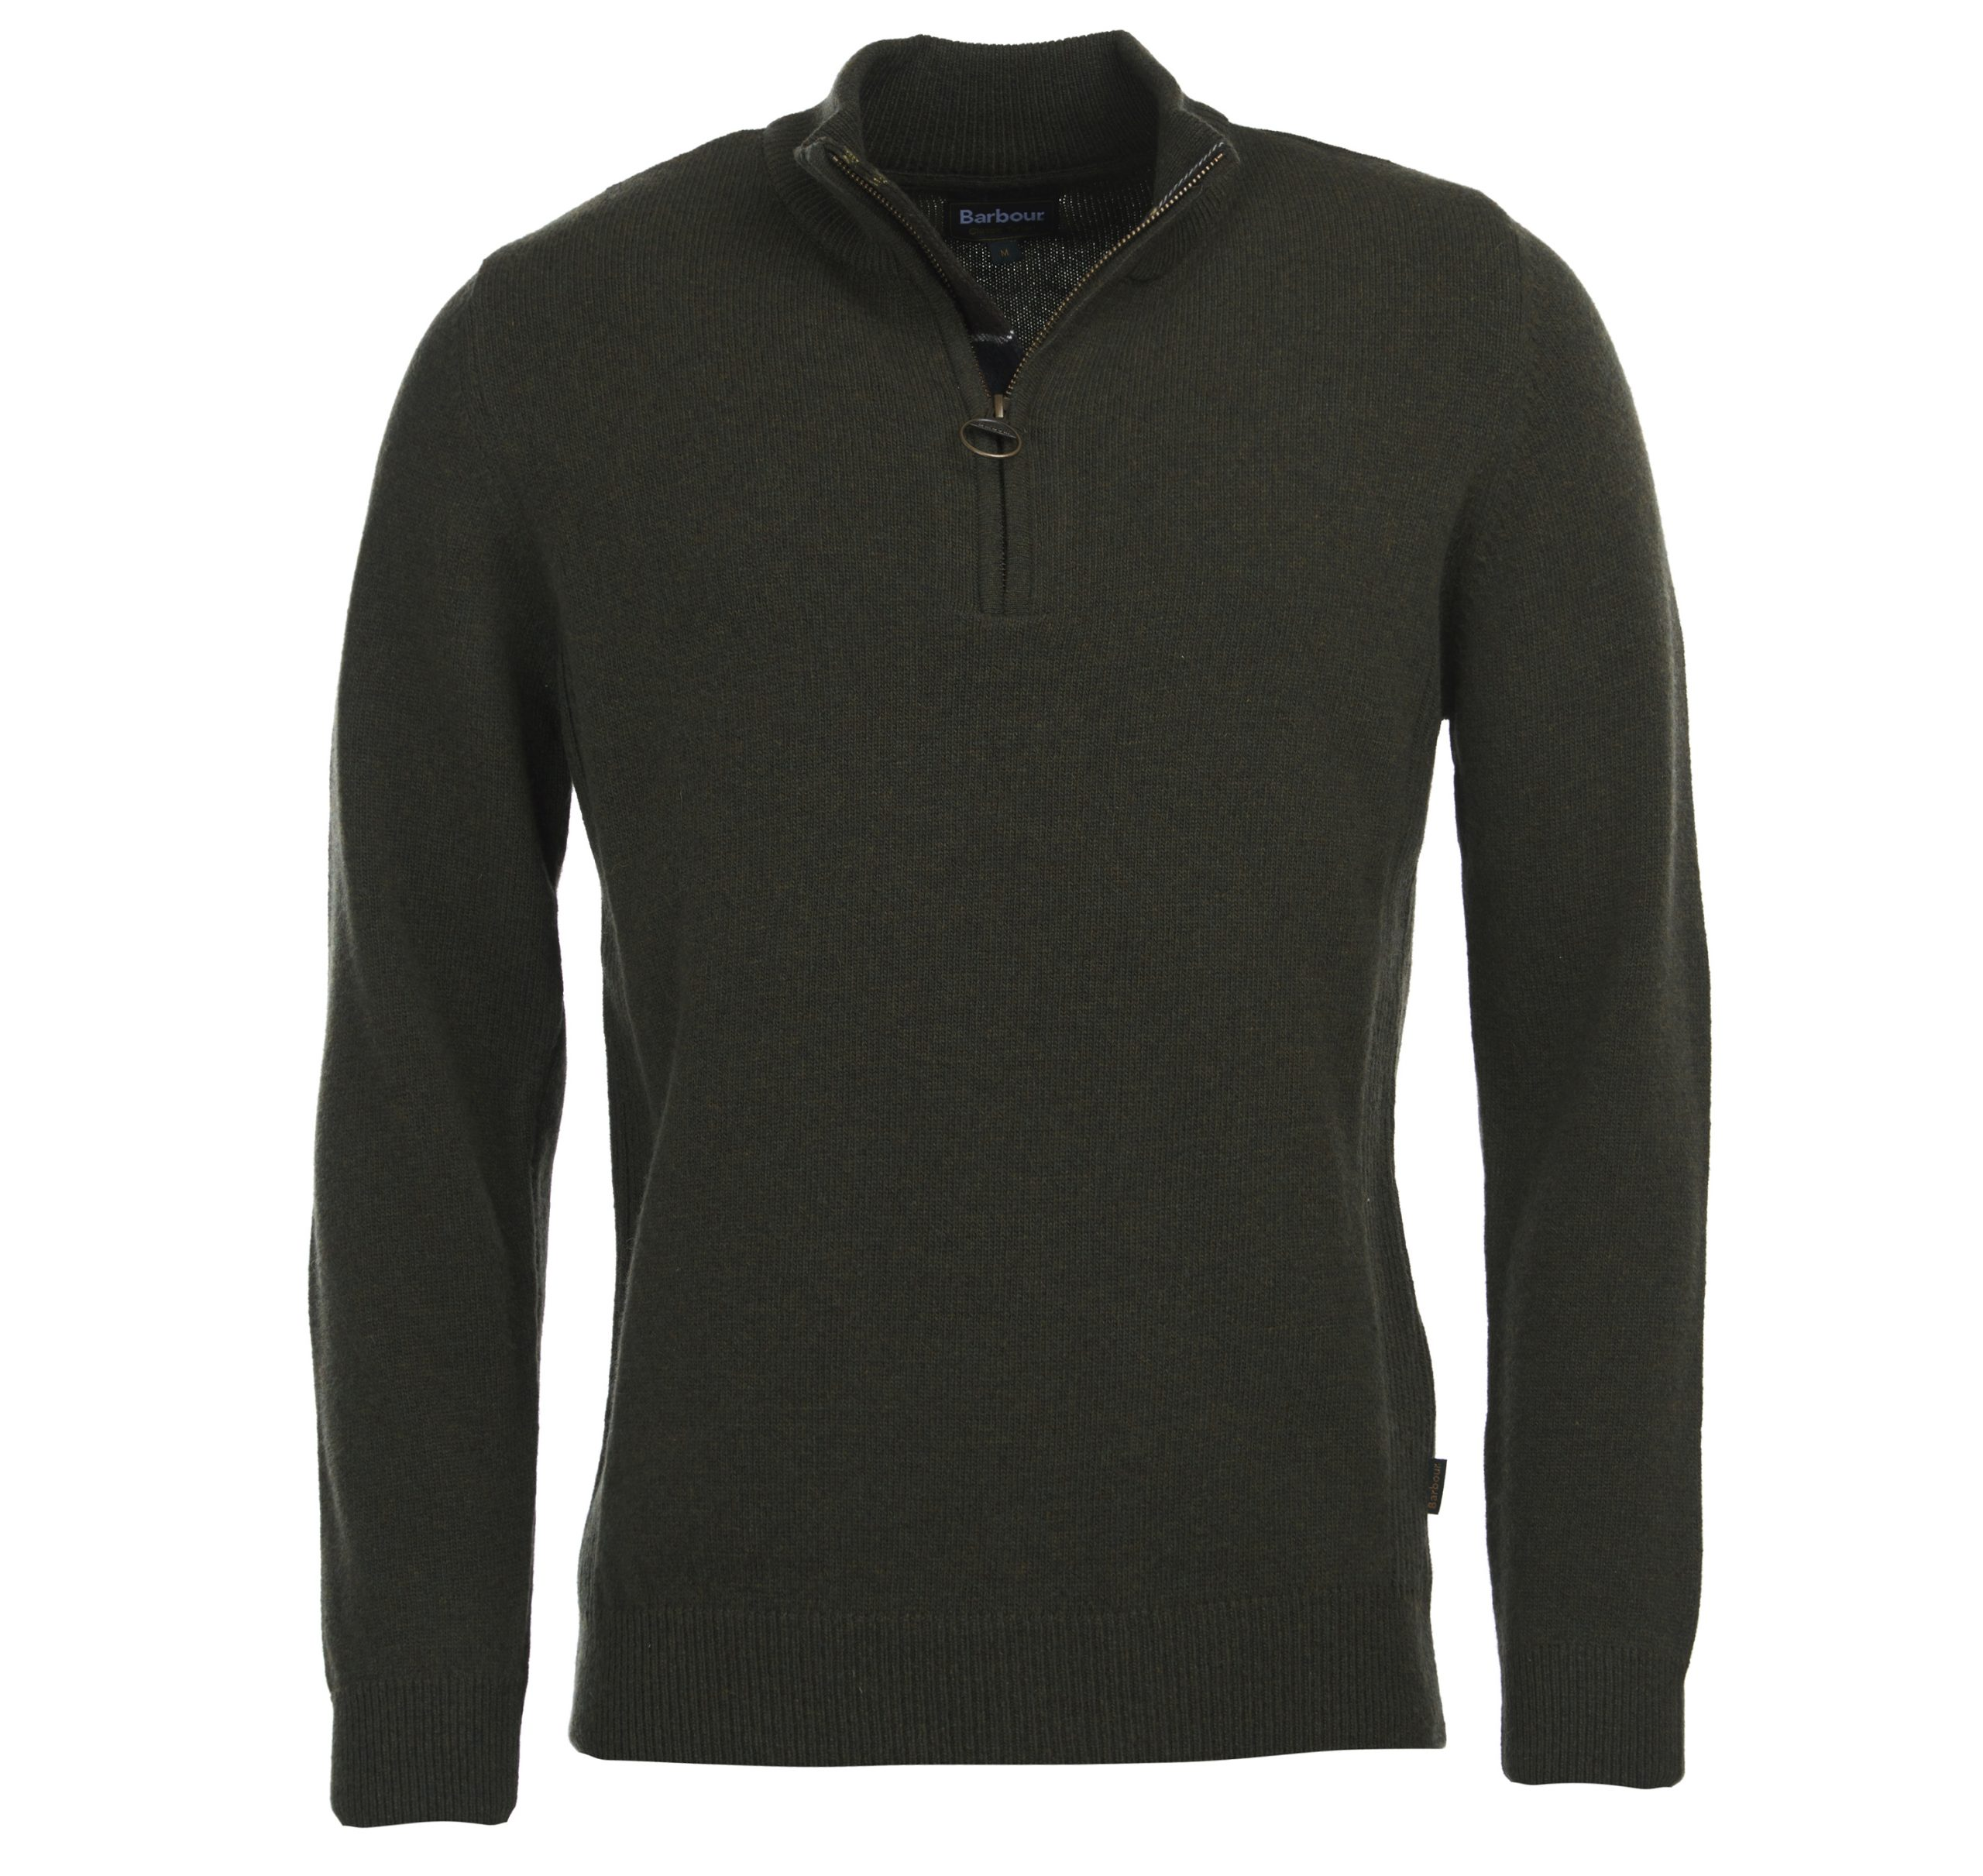 mens barbour holden half zip sweater olive green jail dornoch